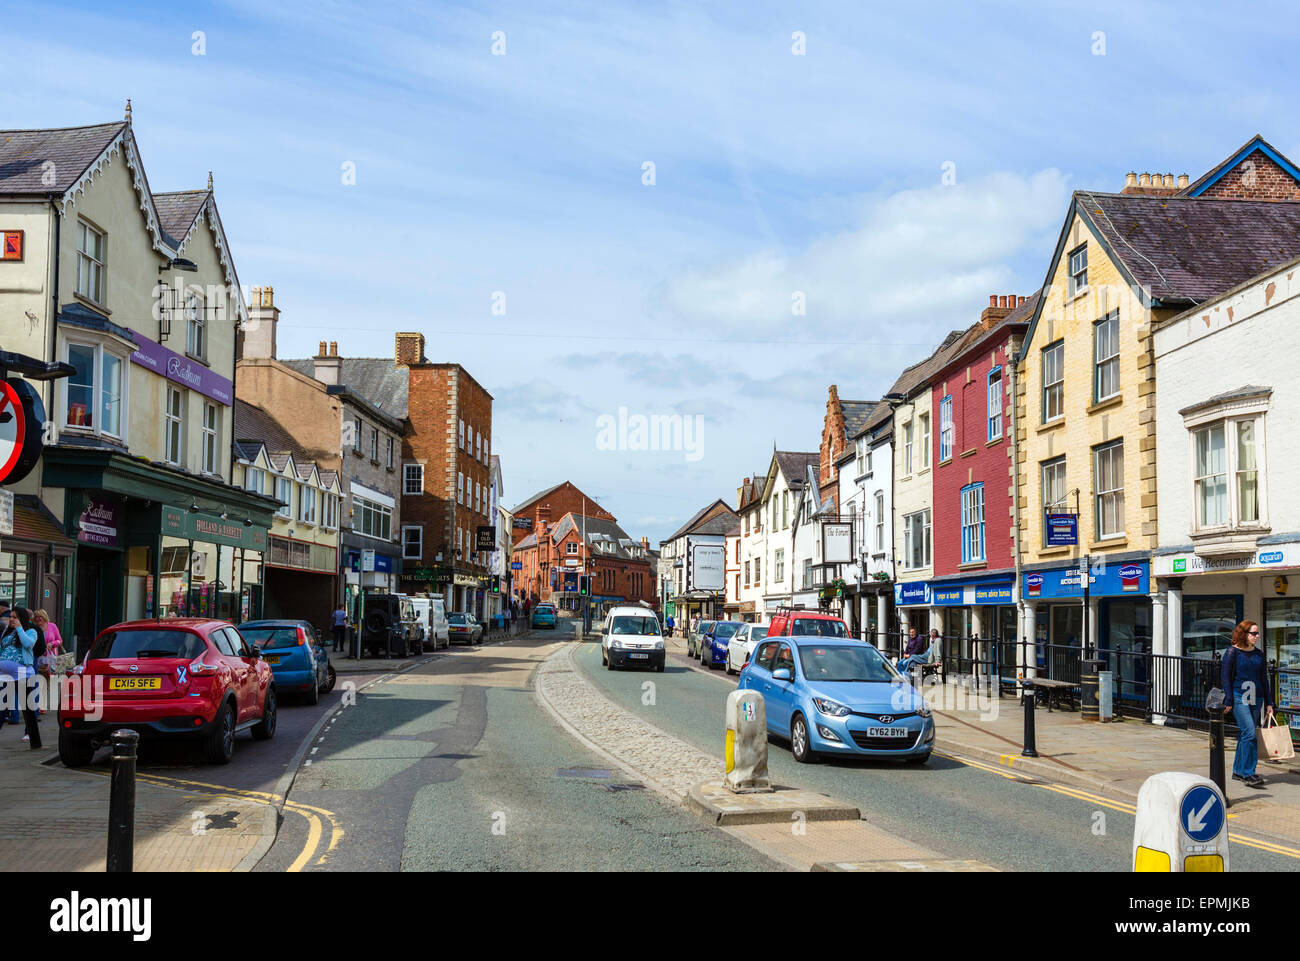 High Street in Denbigh, Denbighshire, Wales, Regno Unito Immagini Stock